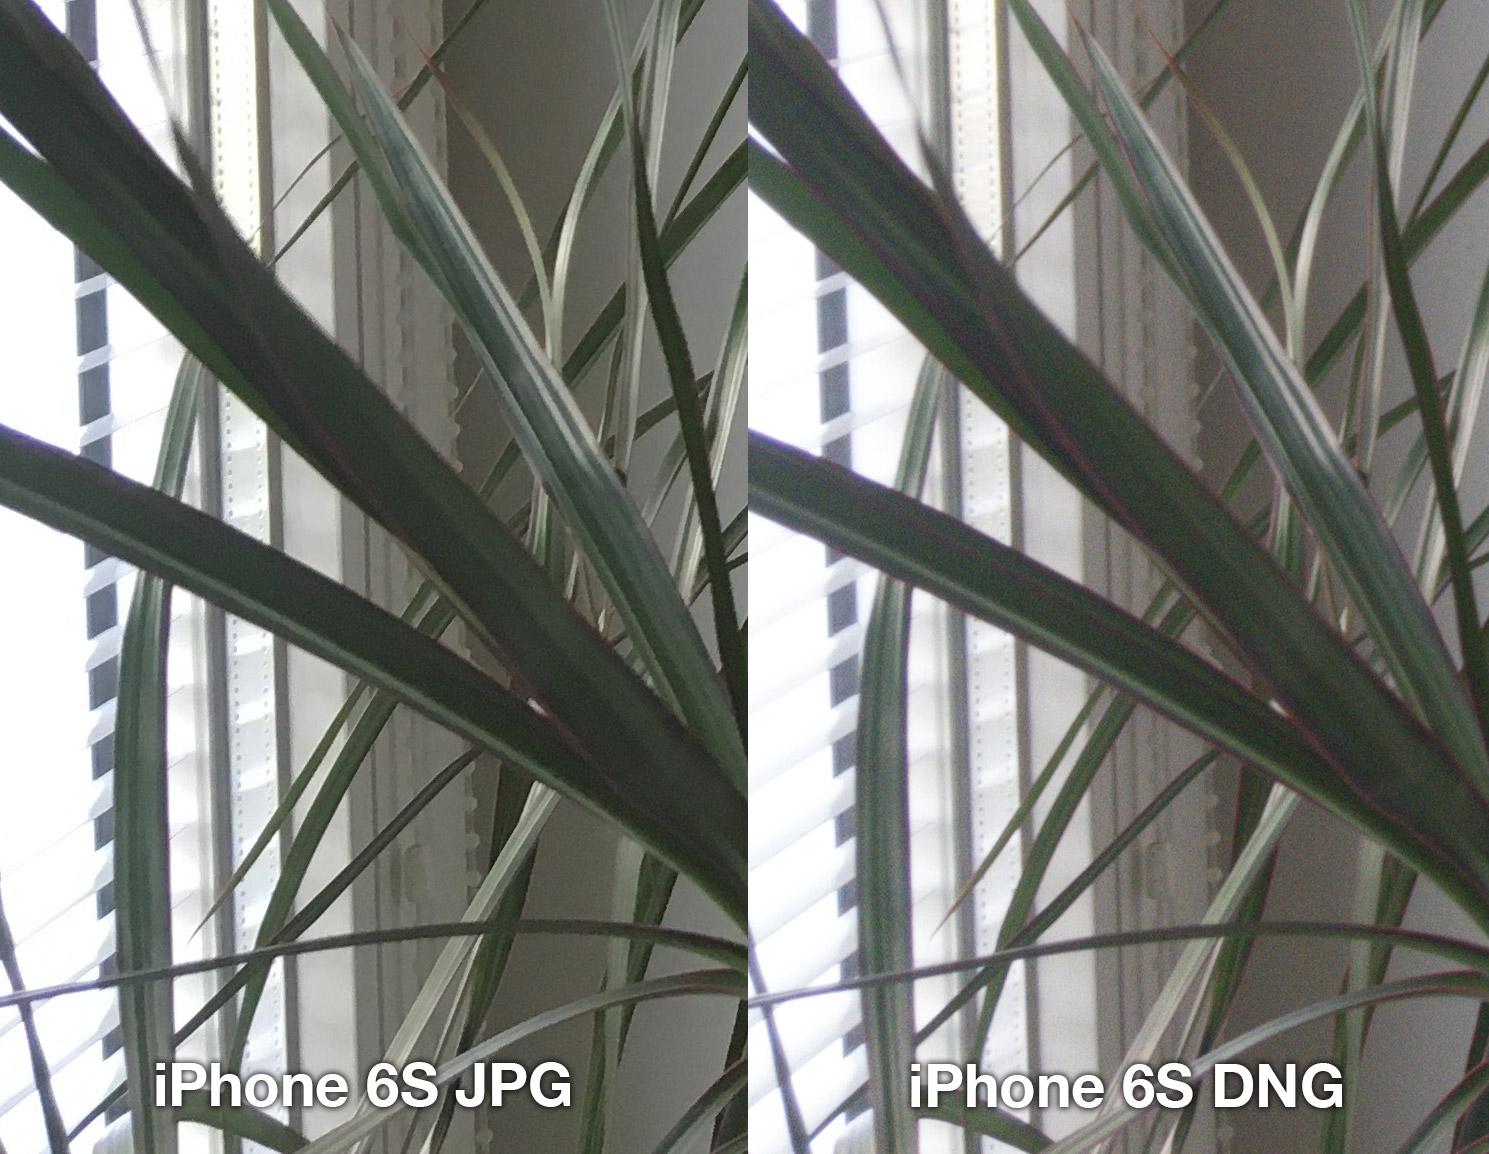 iphone-6s-lightroom-jpg-vs-dng-3